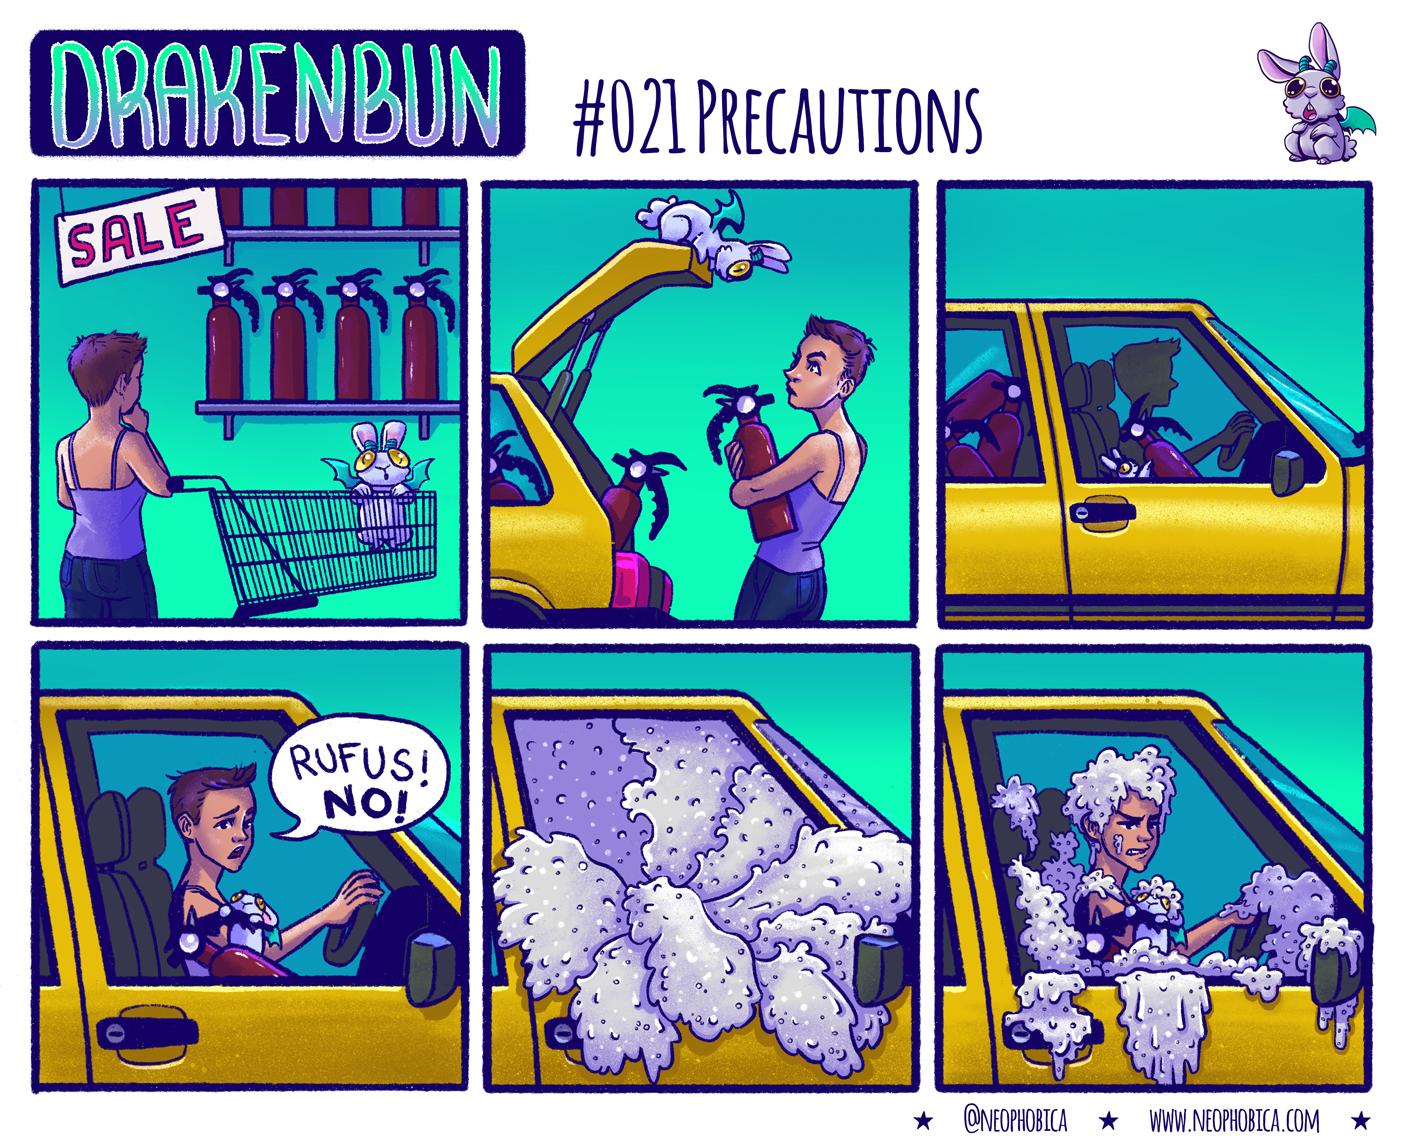 #021 Precautions